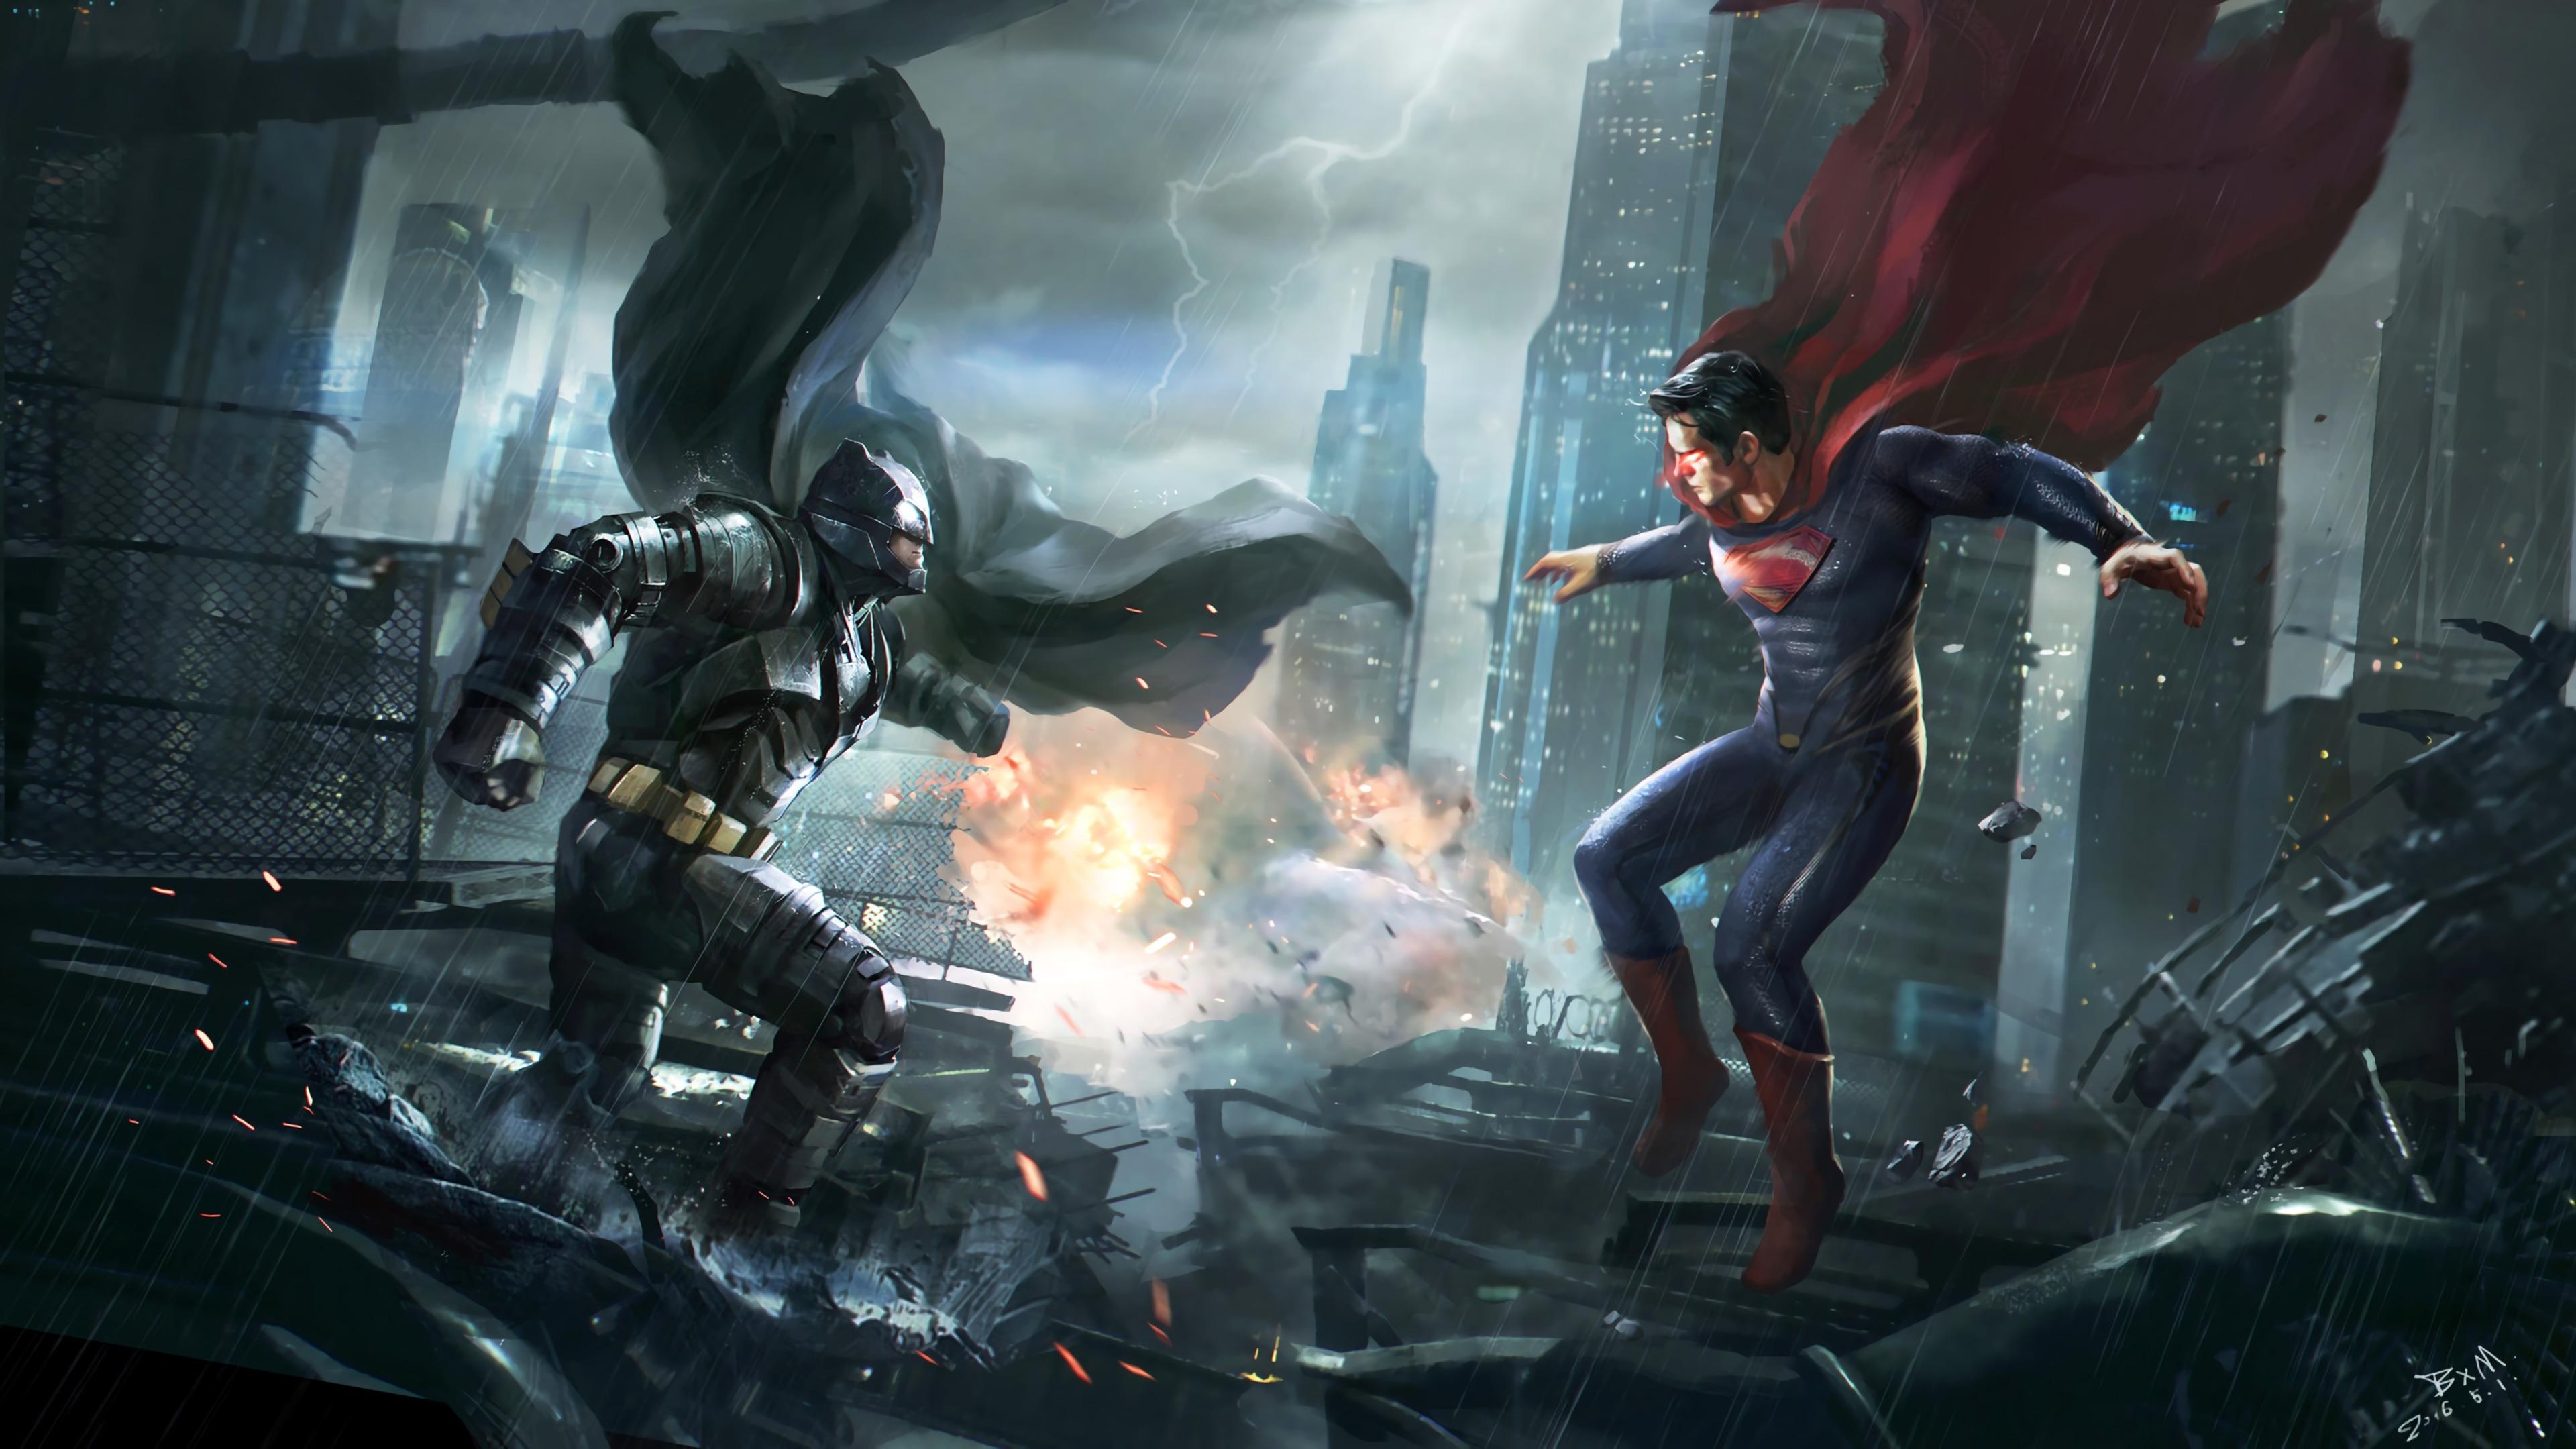 batman super man 1568054596 - Batman Super Man - superman wallpapers, superheroes wallpapers, hd-wallpapers, digital art wallpapers, batman wallpapers, artwork wallpapers, artstation wallpapers, 4k-wallpapers